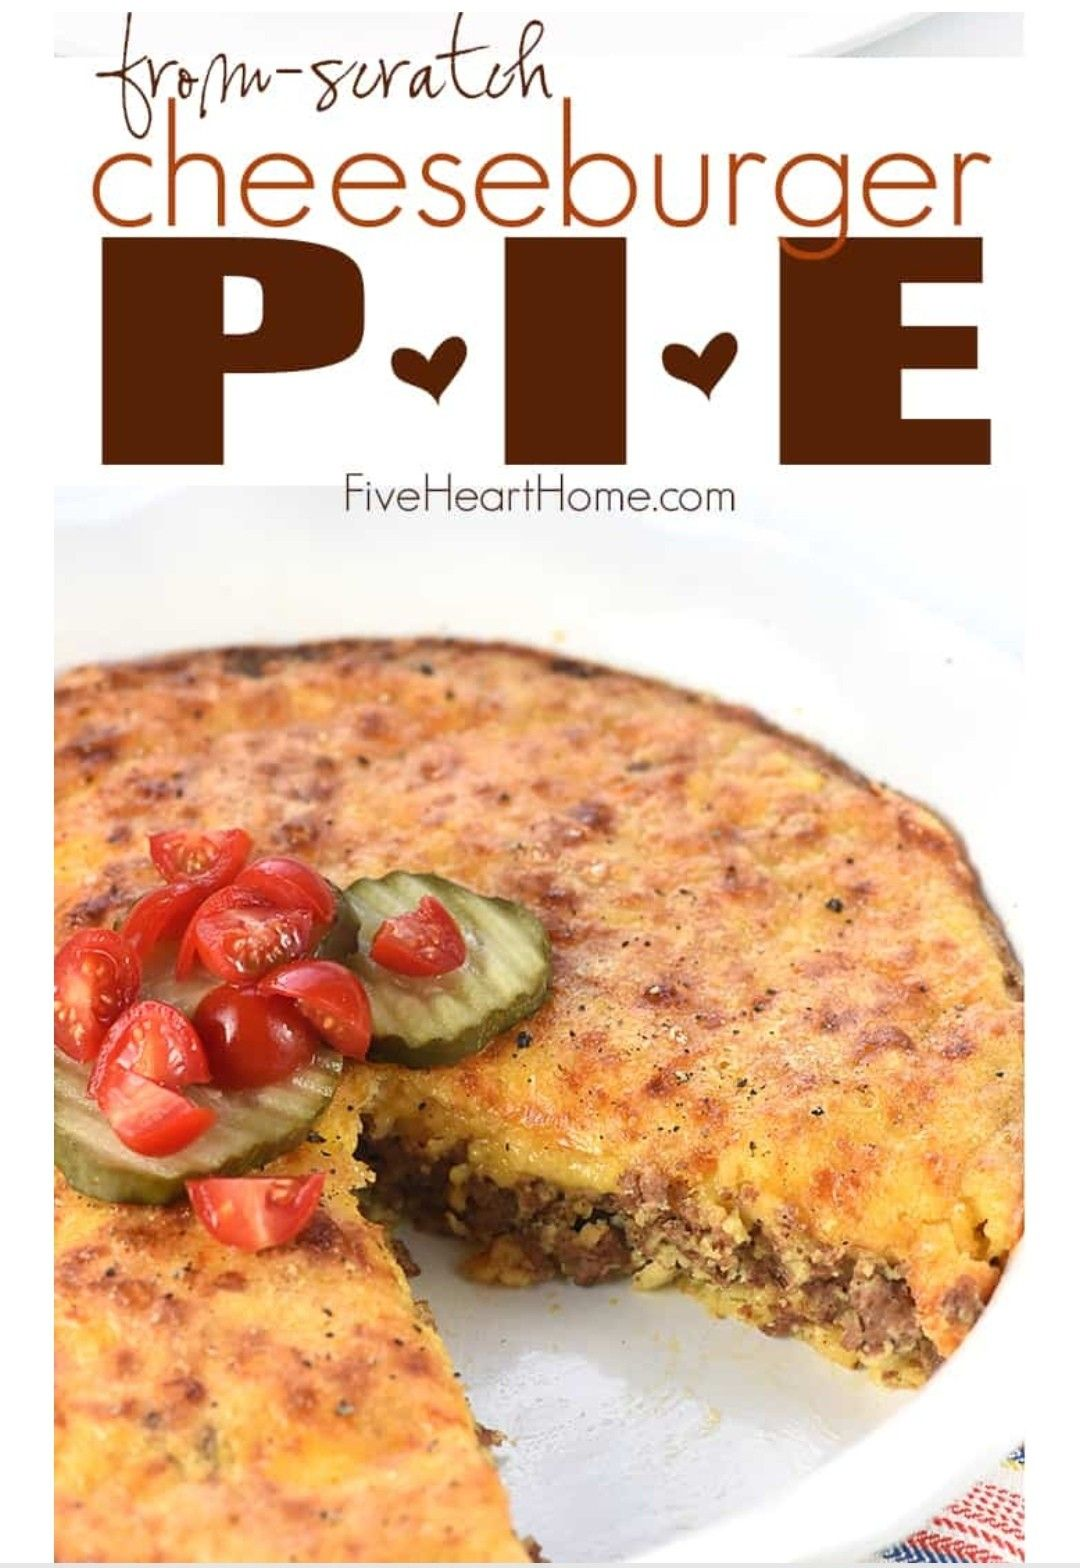 Cheeseburger Pie (without Bisquick) #impossiblecheeseburgerpie